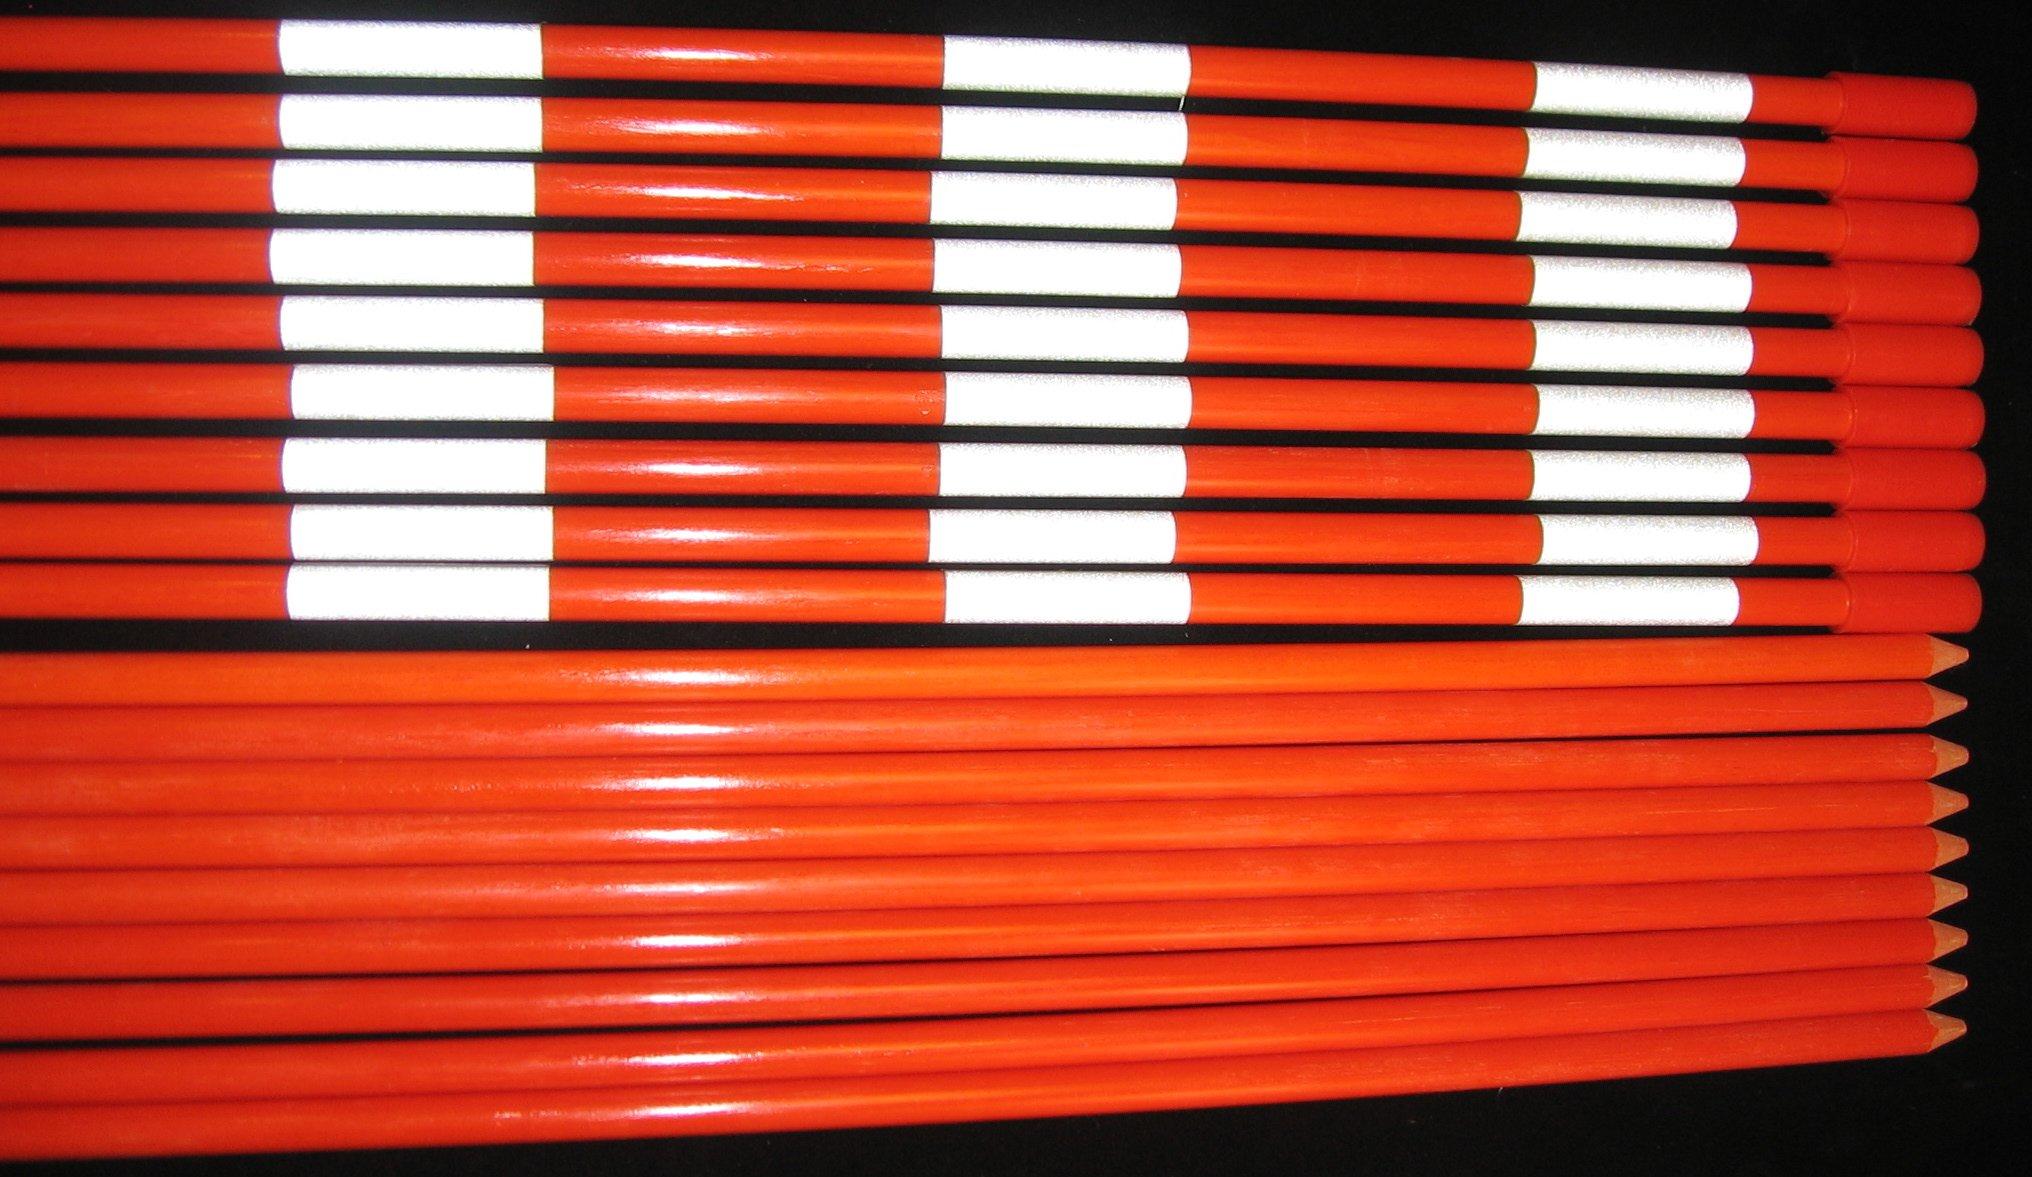 (72 each) 60'' x (5/16 dia.) X3 Optic Orange Reflective Fiberglass Driveway Markers. 1 case of 72 markers.